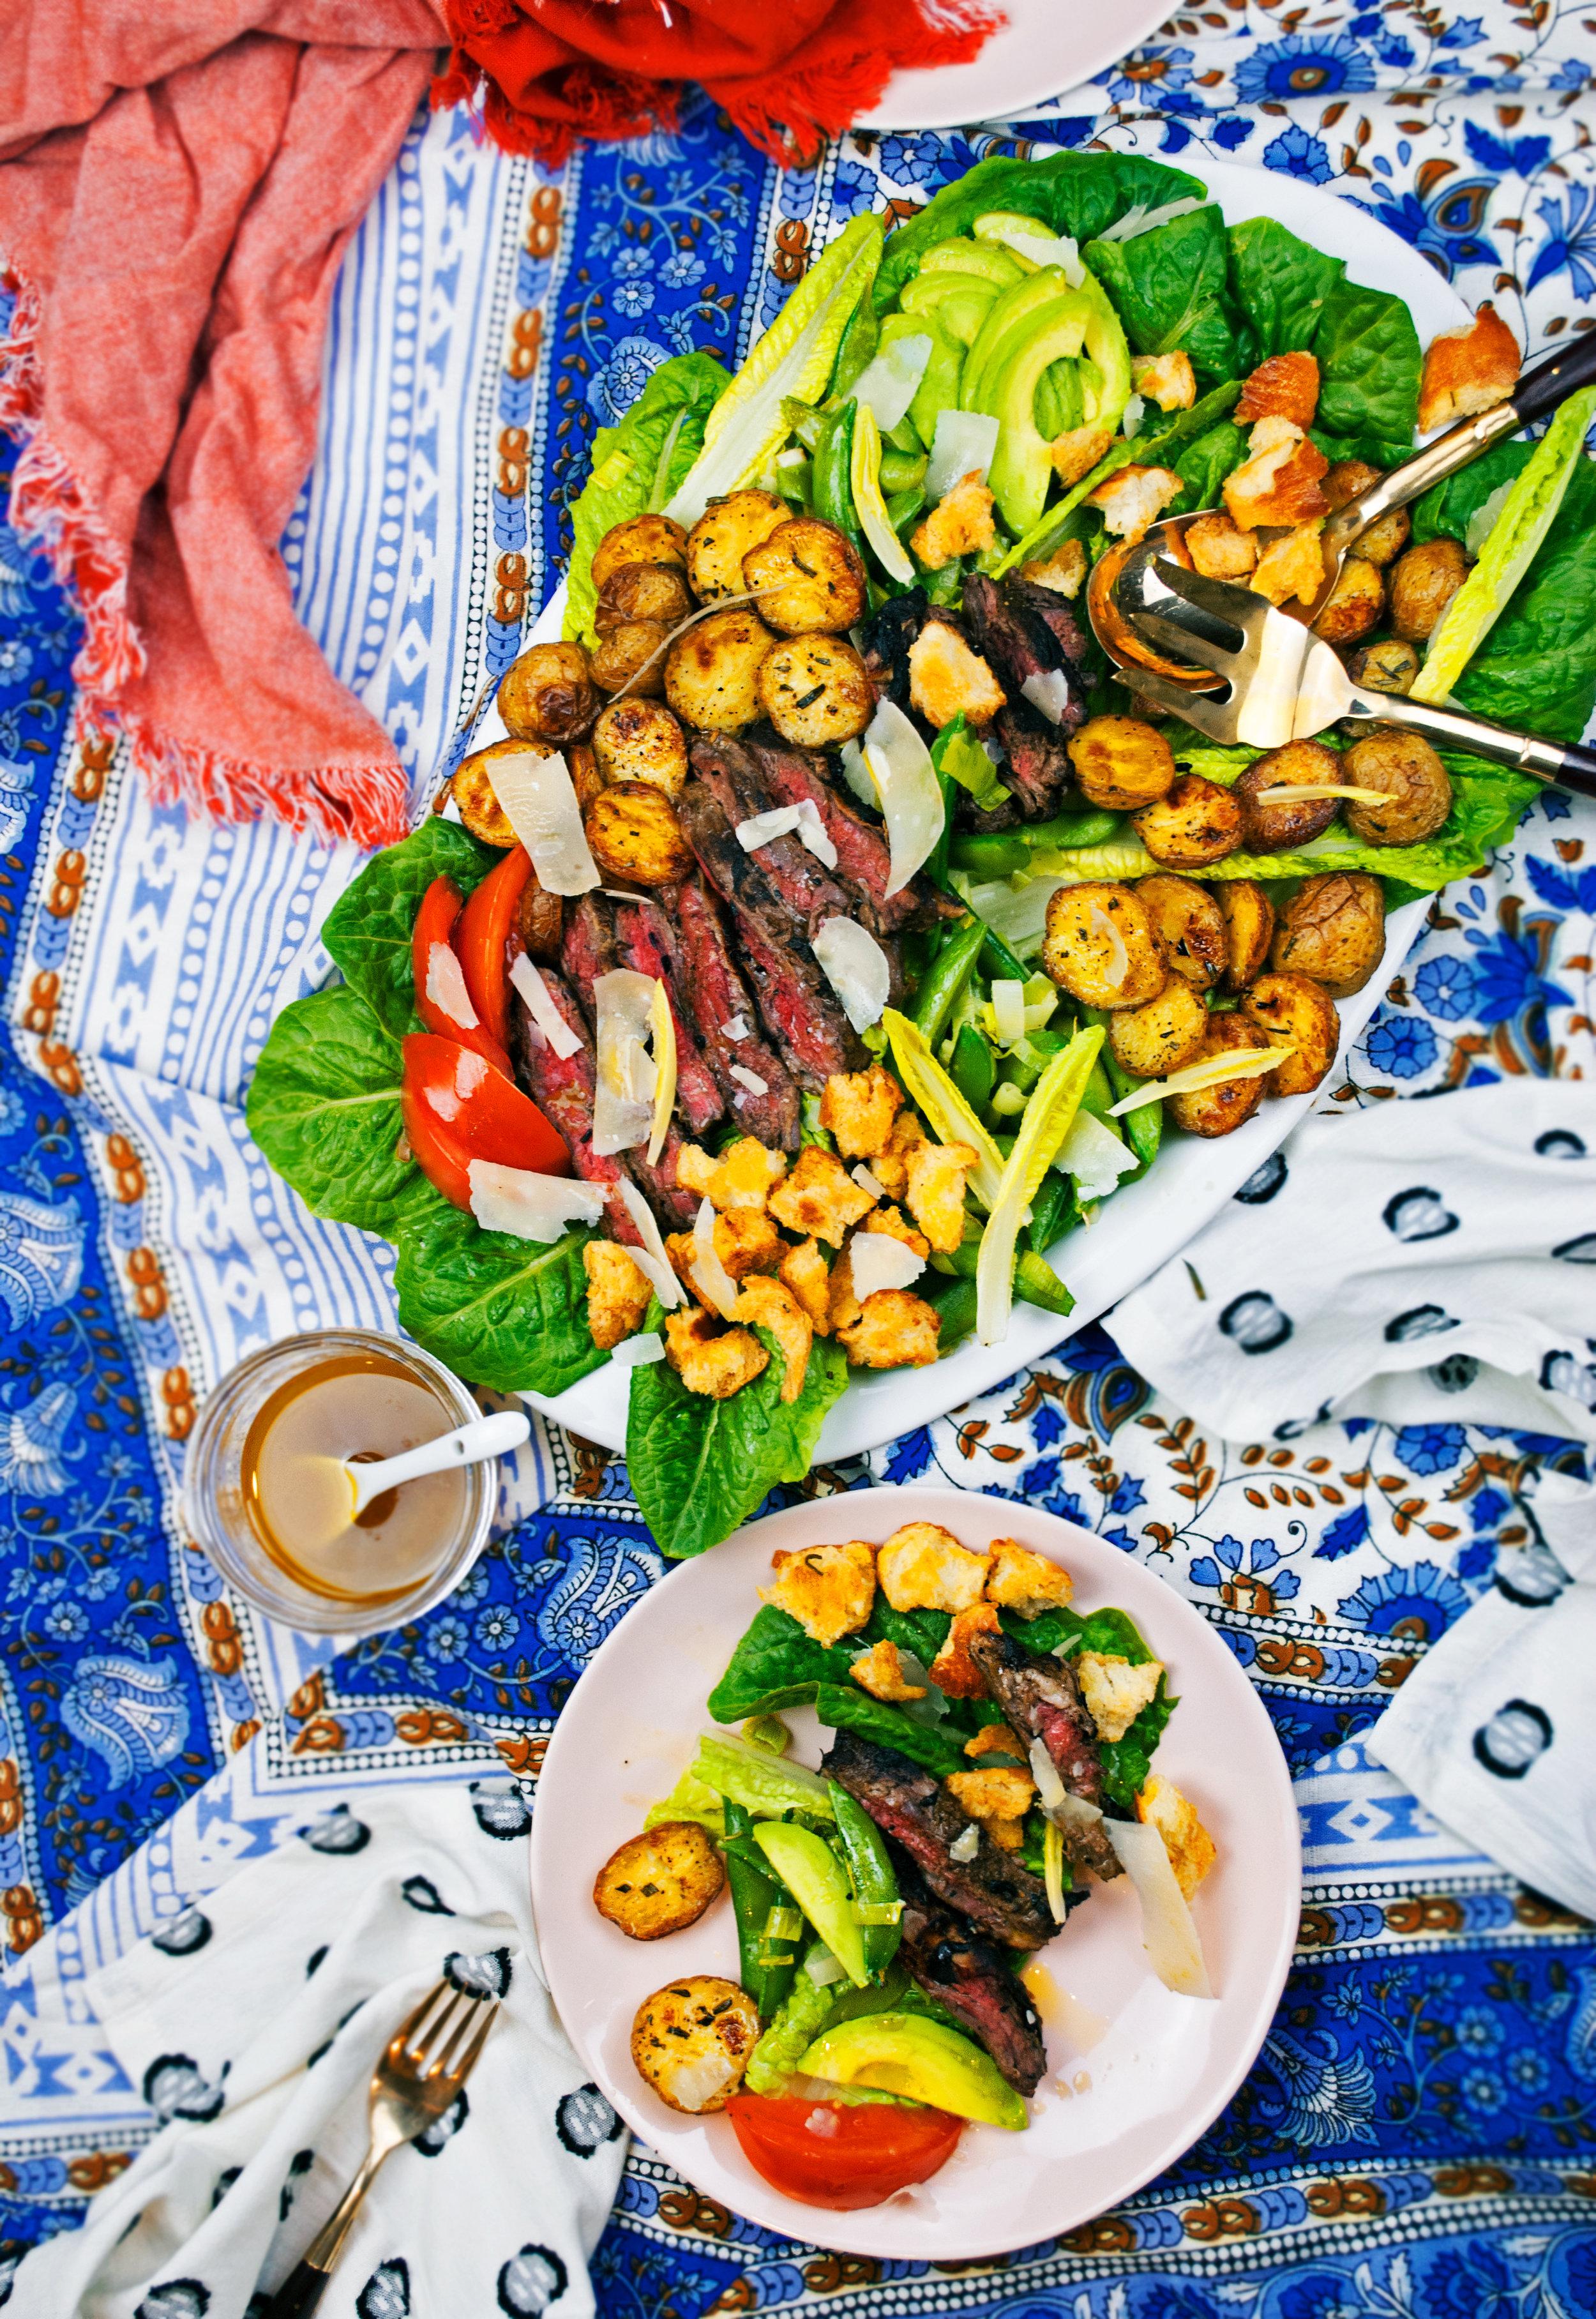 flank steak salad 2.jpg